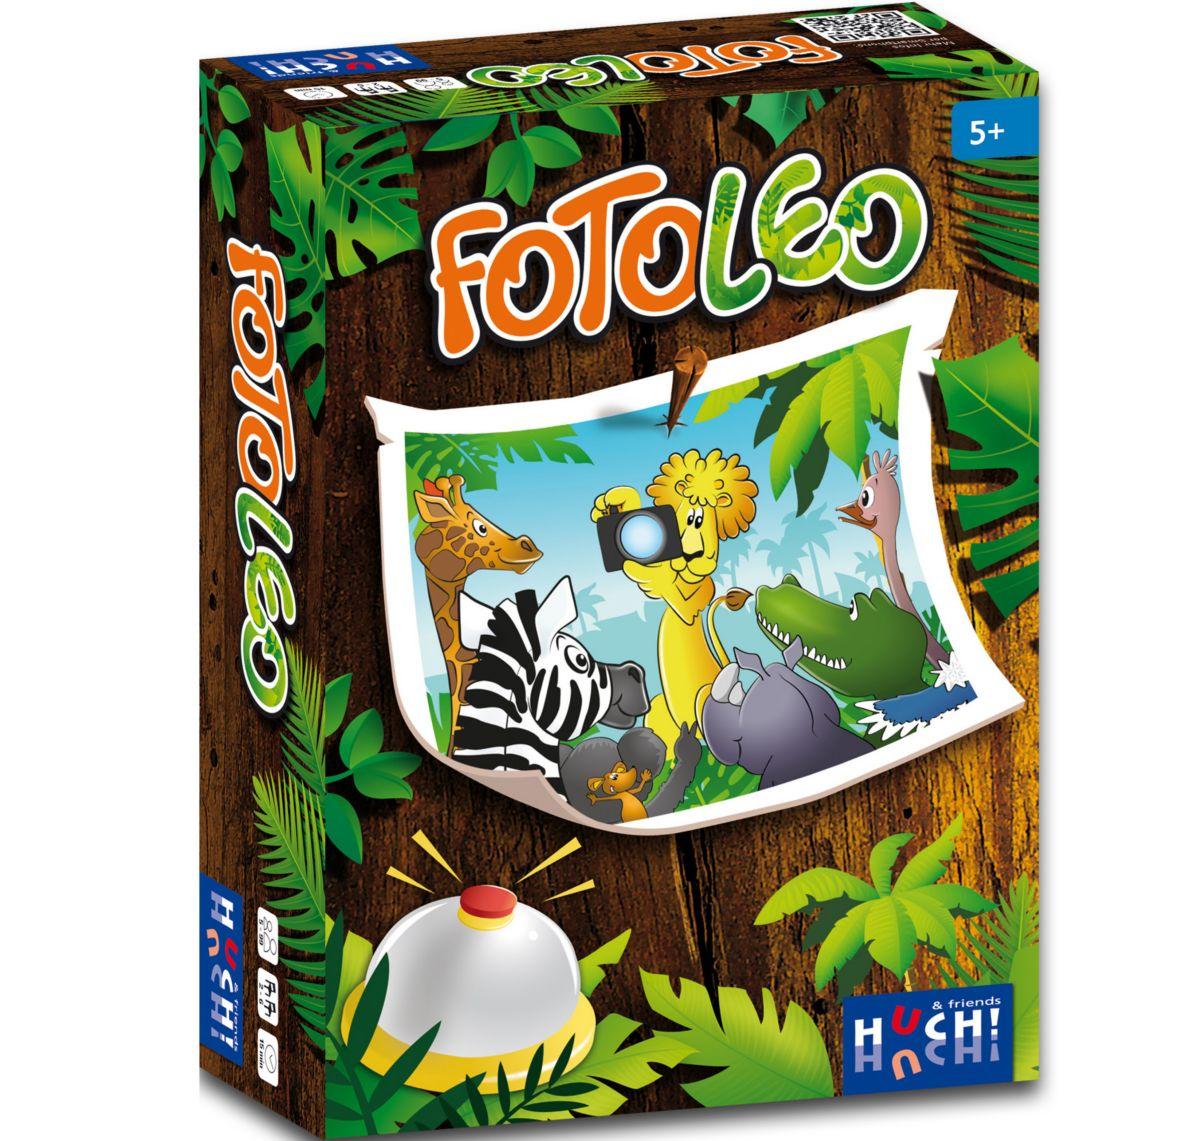 Huch! & friends Kinderspiel, »Fotoleo«